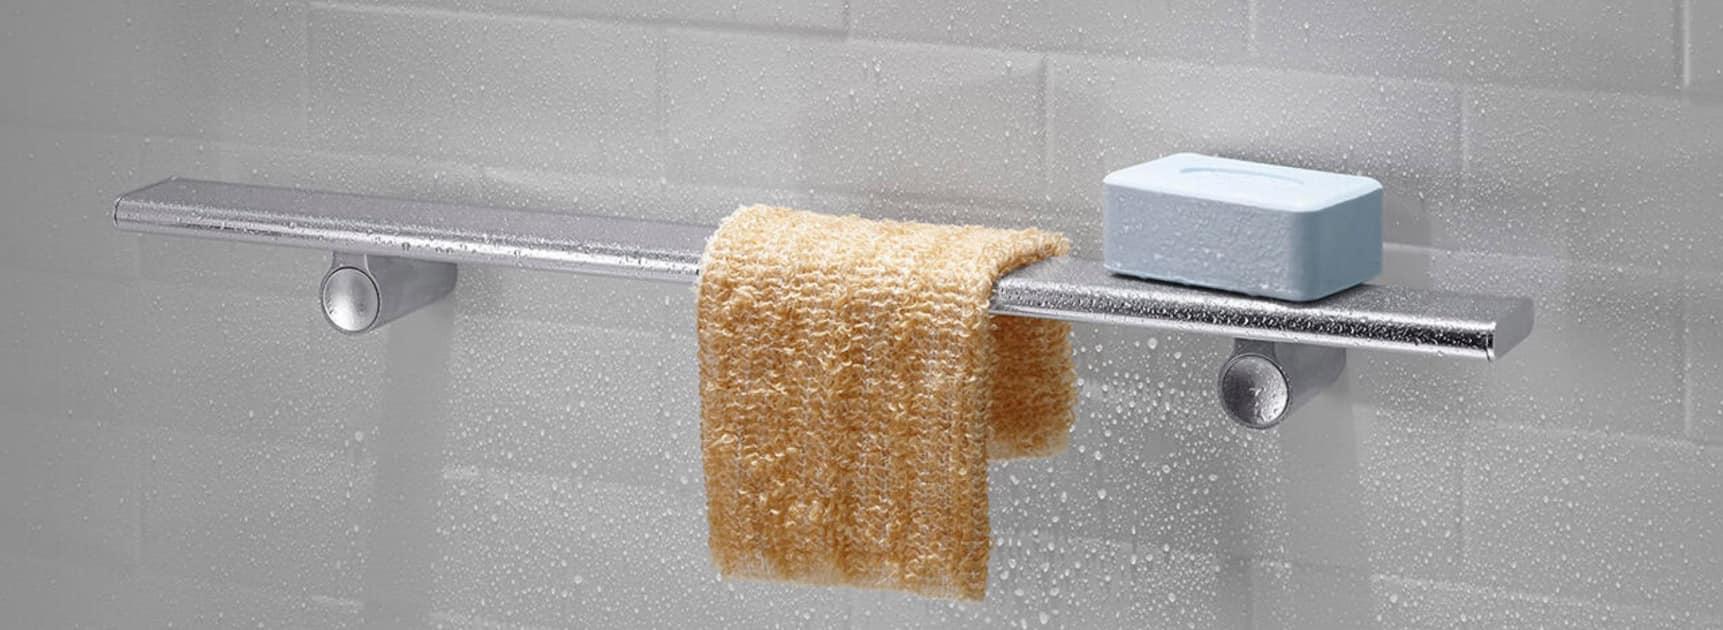 Bathroom safety products checklist